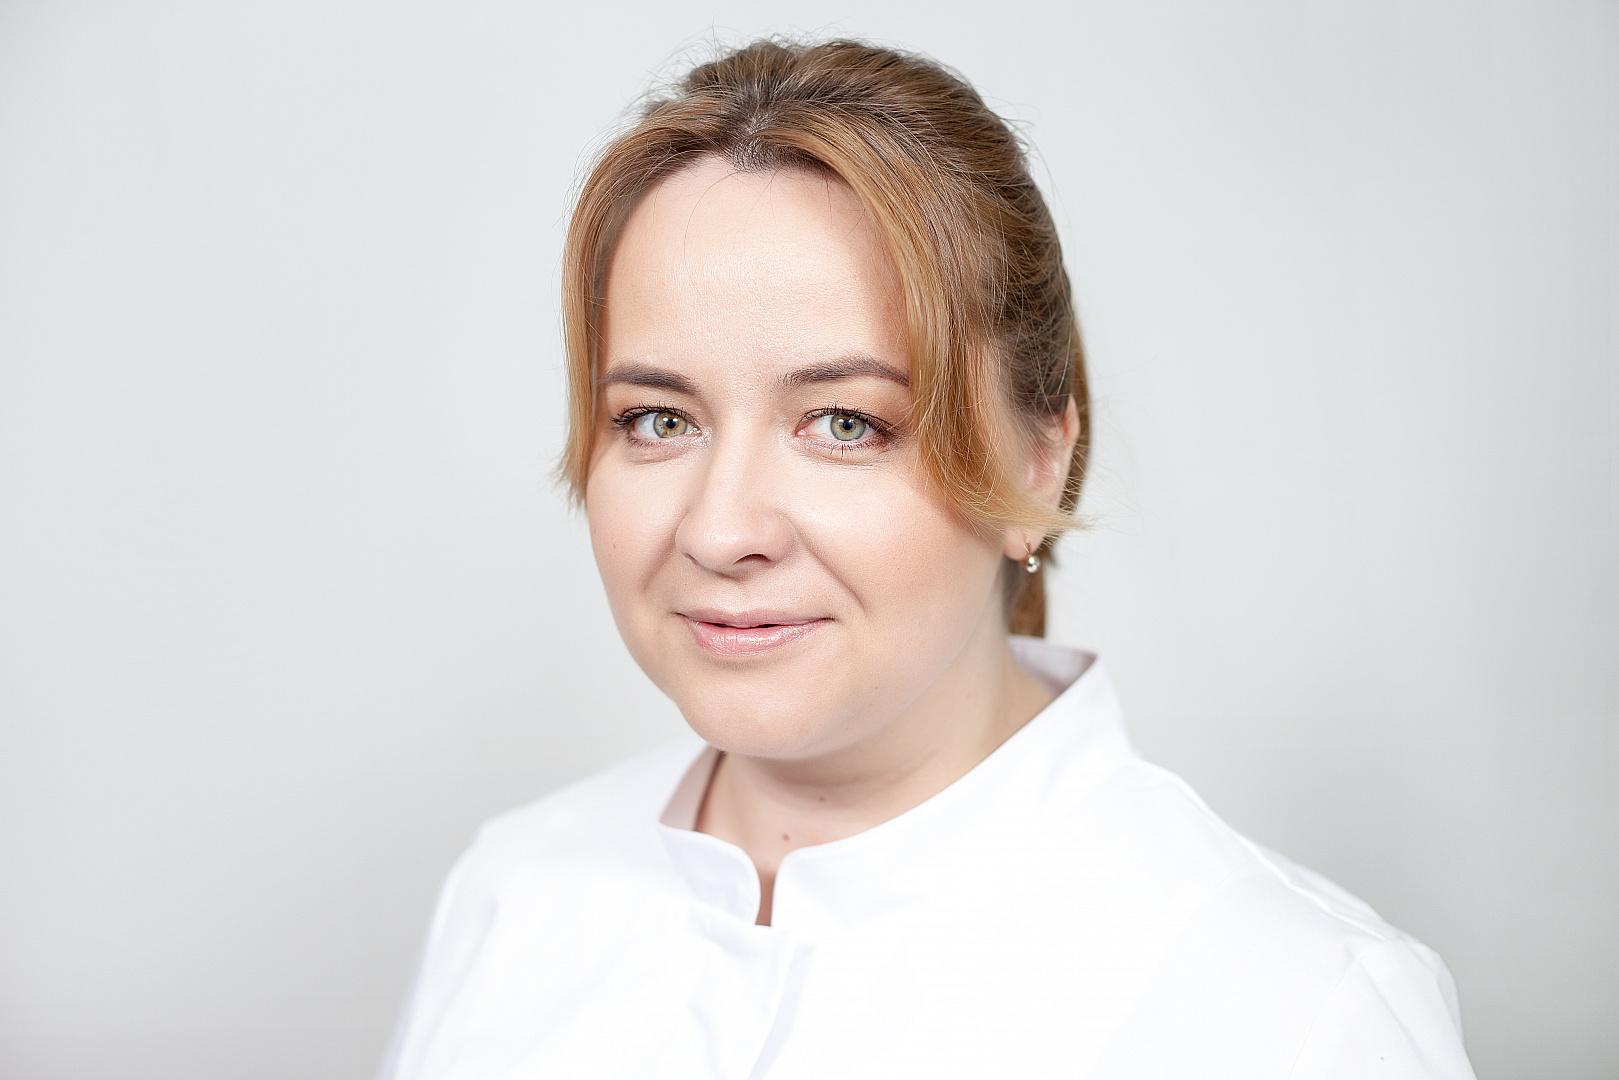 Захарченко Екатерина Алексеевна, врач-стоматолог-терапевт